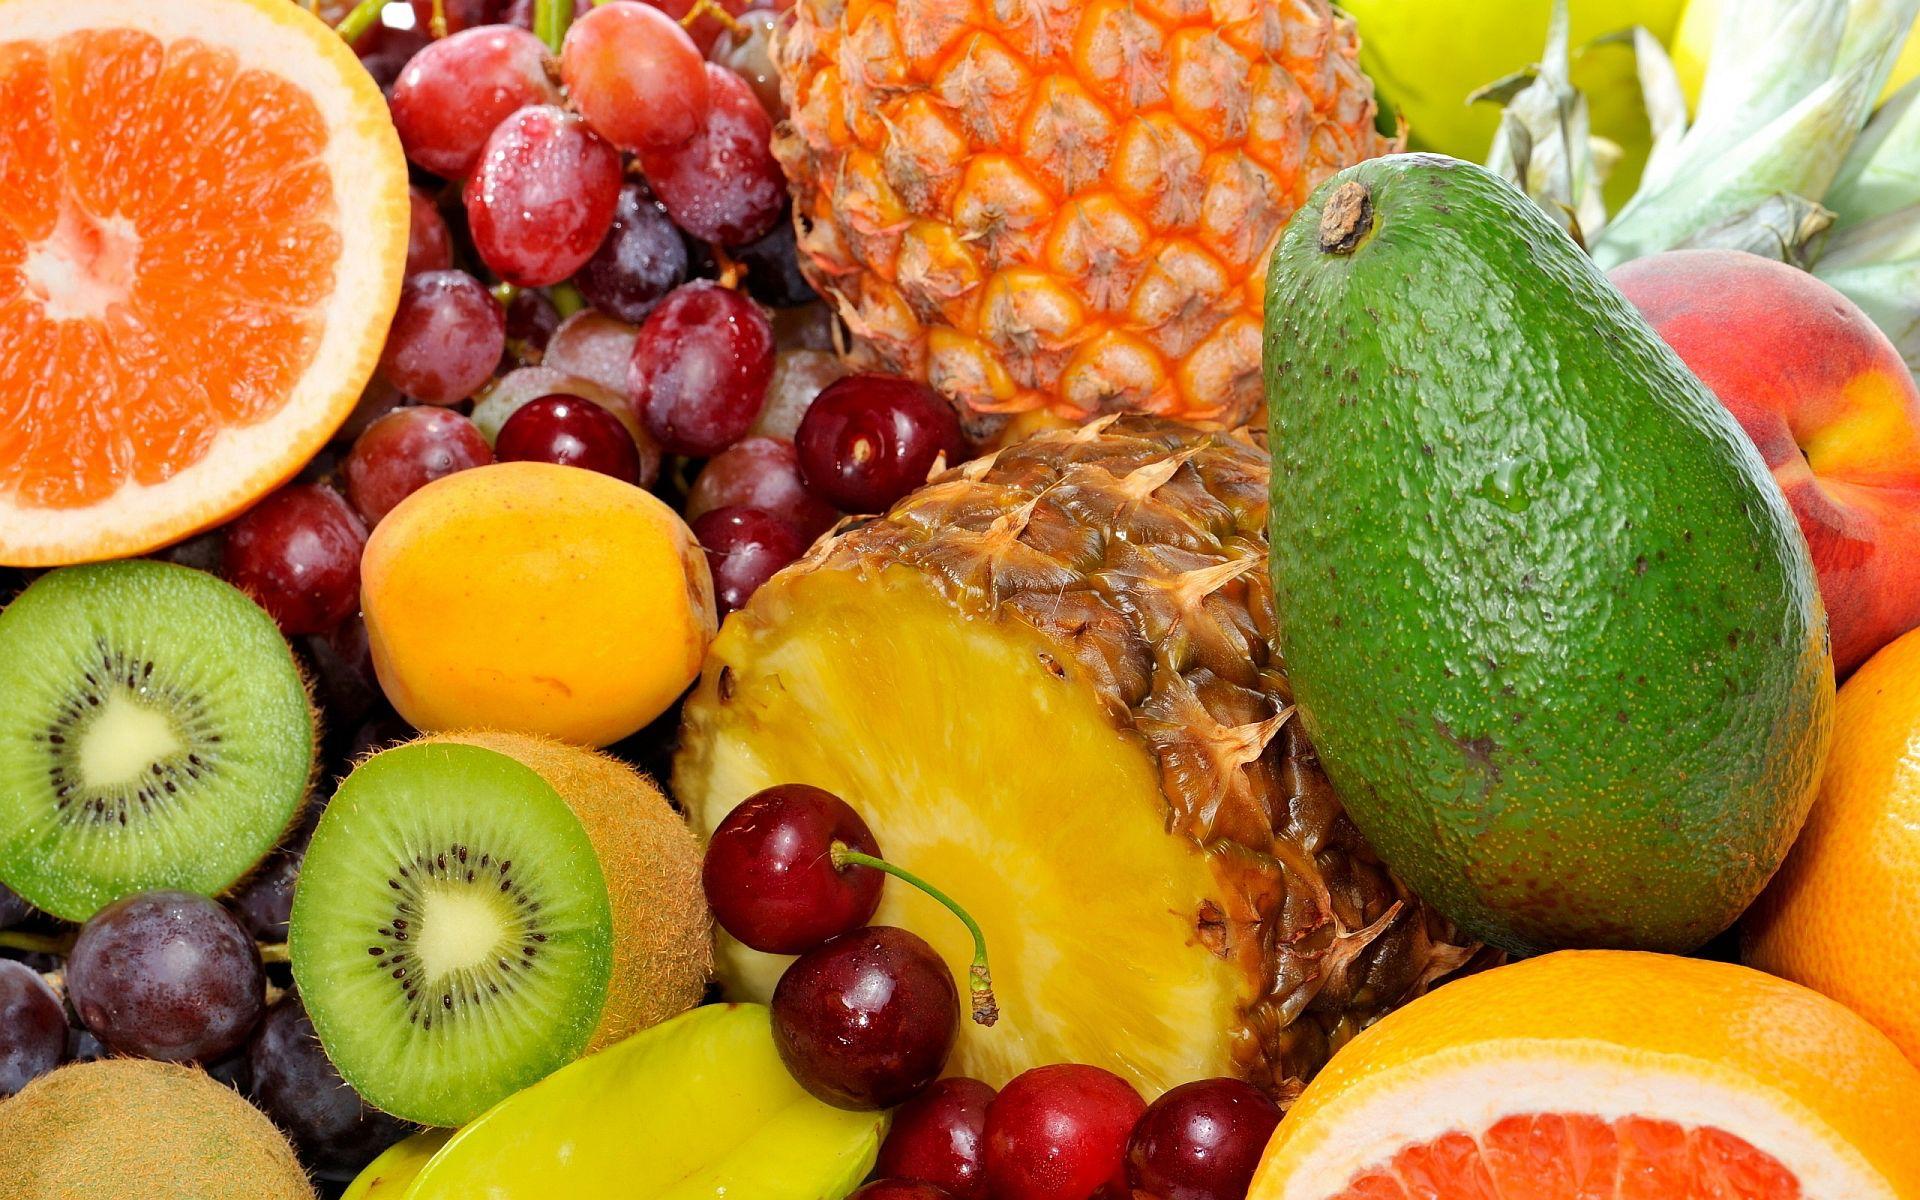 Fresh fruit wallpaper - Fresh Fruit Hd Desktop Wallpaper Available For Free Download At Mrhdwallpapers Com